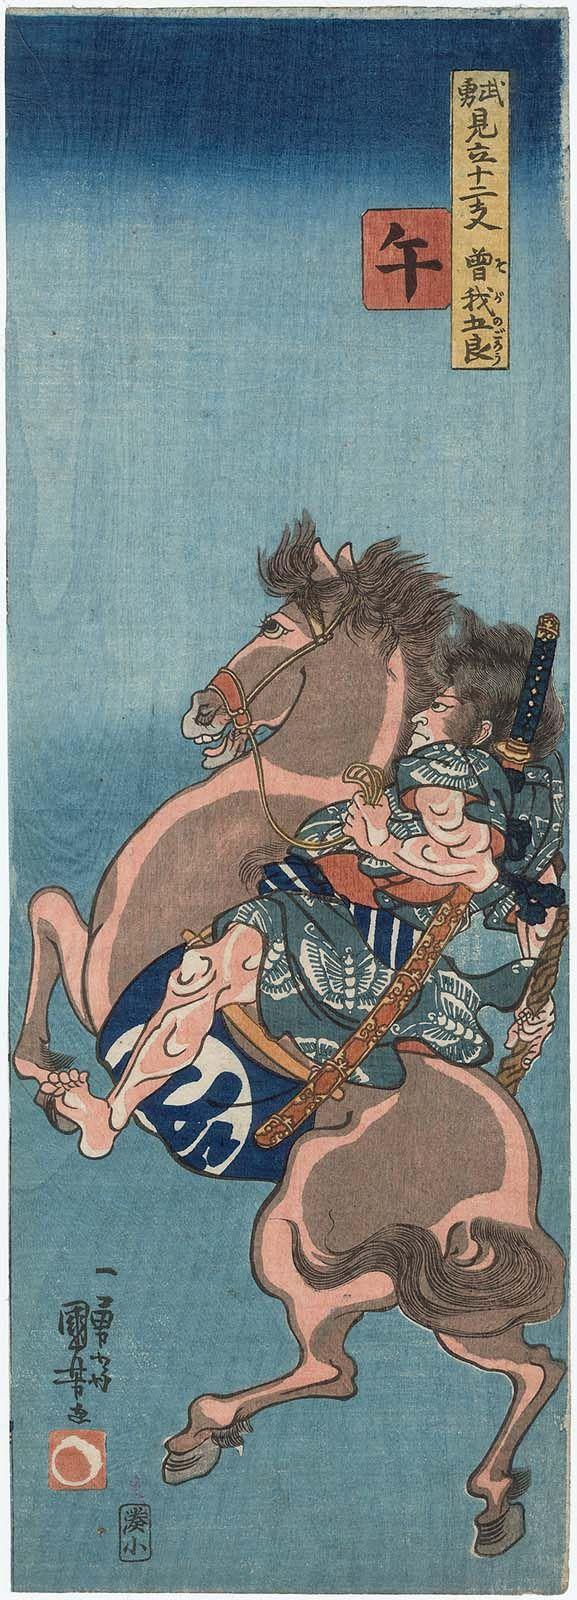 Horse (Uma): Soga no Gorô, from the series Heroes Representing the Twelve Animals of the Zodiac (Buyû mitate jûnishi) Japanese about 1840 (Tenpô 11) Artist Utagawa Kuniyoshi (Japanese, 1797–1861), Publisher Minatoya Kohei (Japanese) DIMENSIONS Chûtanzaku; 35.4 x 12.5 cm (13 15/16 x 4 15/16 in.) Currently at the MFA ACCESSION NUMBER 11.16583 MEDIUM OR TECHNIQUE Woodblock print (nishiki-e); ink and color on paper